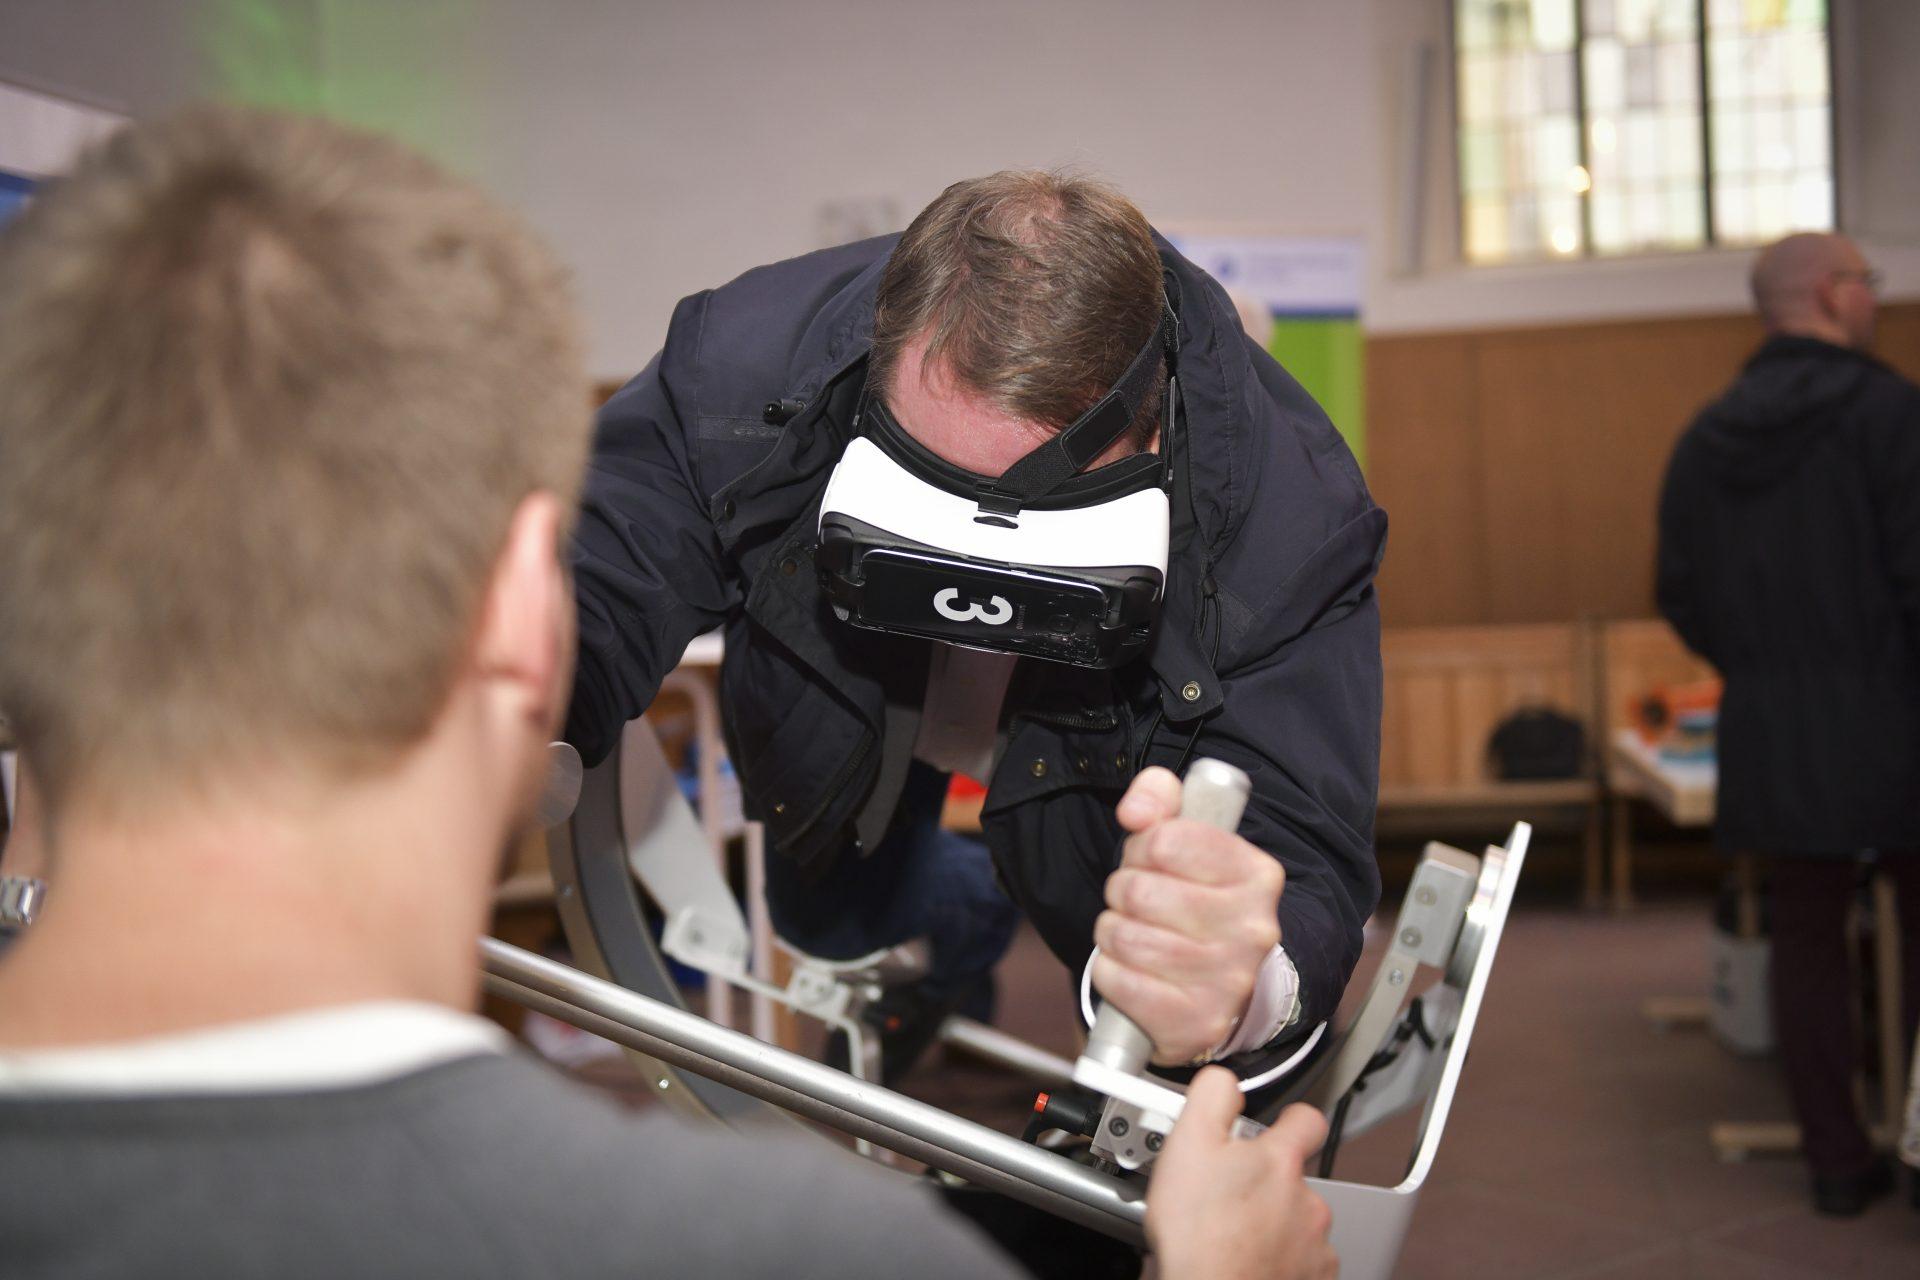 Ein Mann liegt in einem Virtual-reality-Flugsimulator.